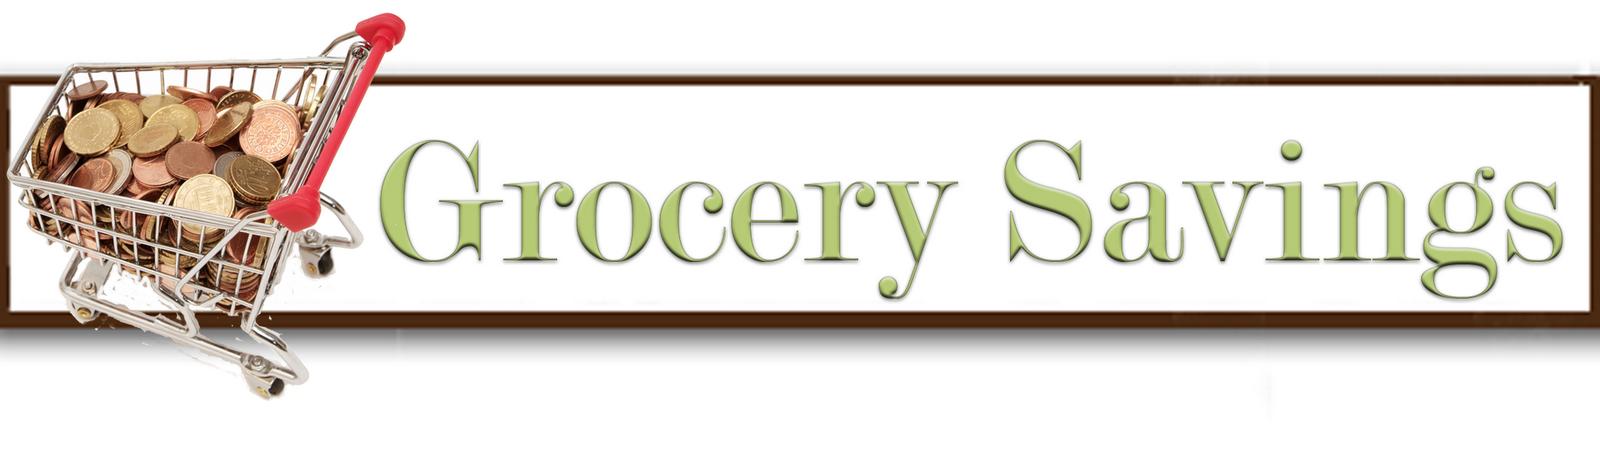 [grocerytitlebar.png]